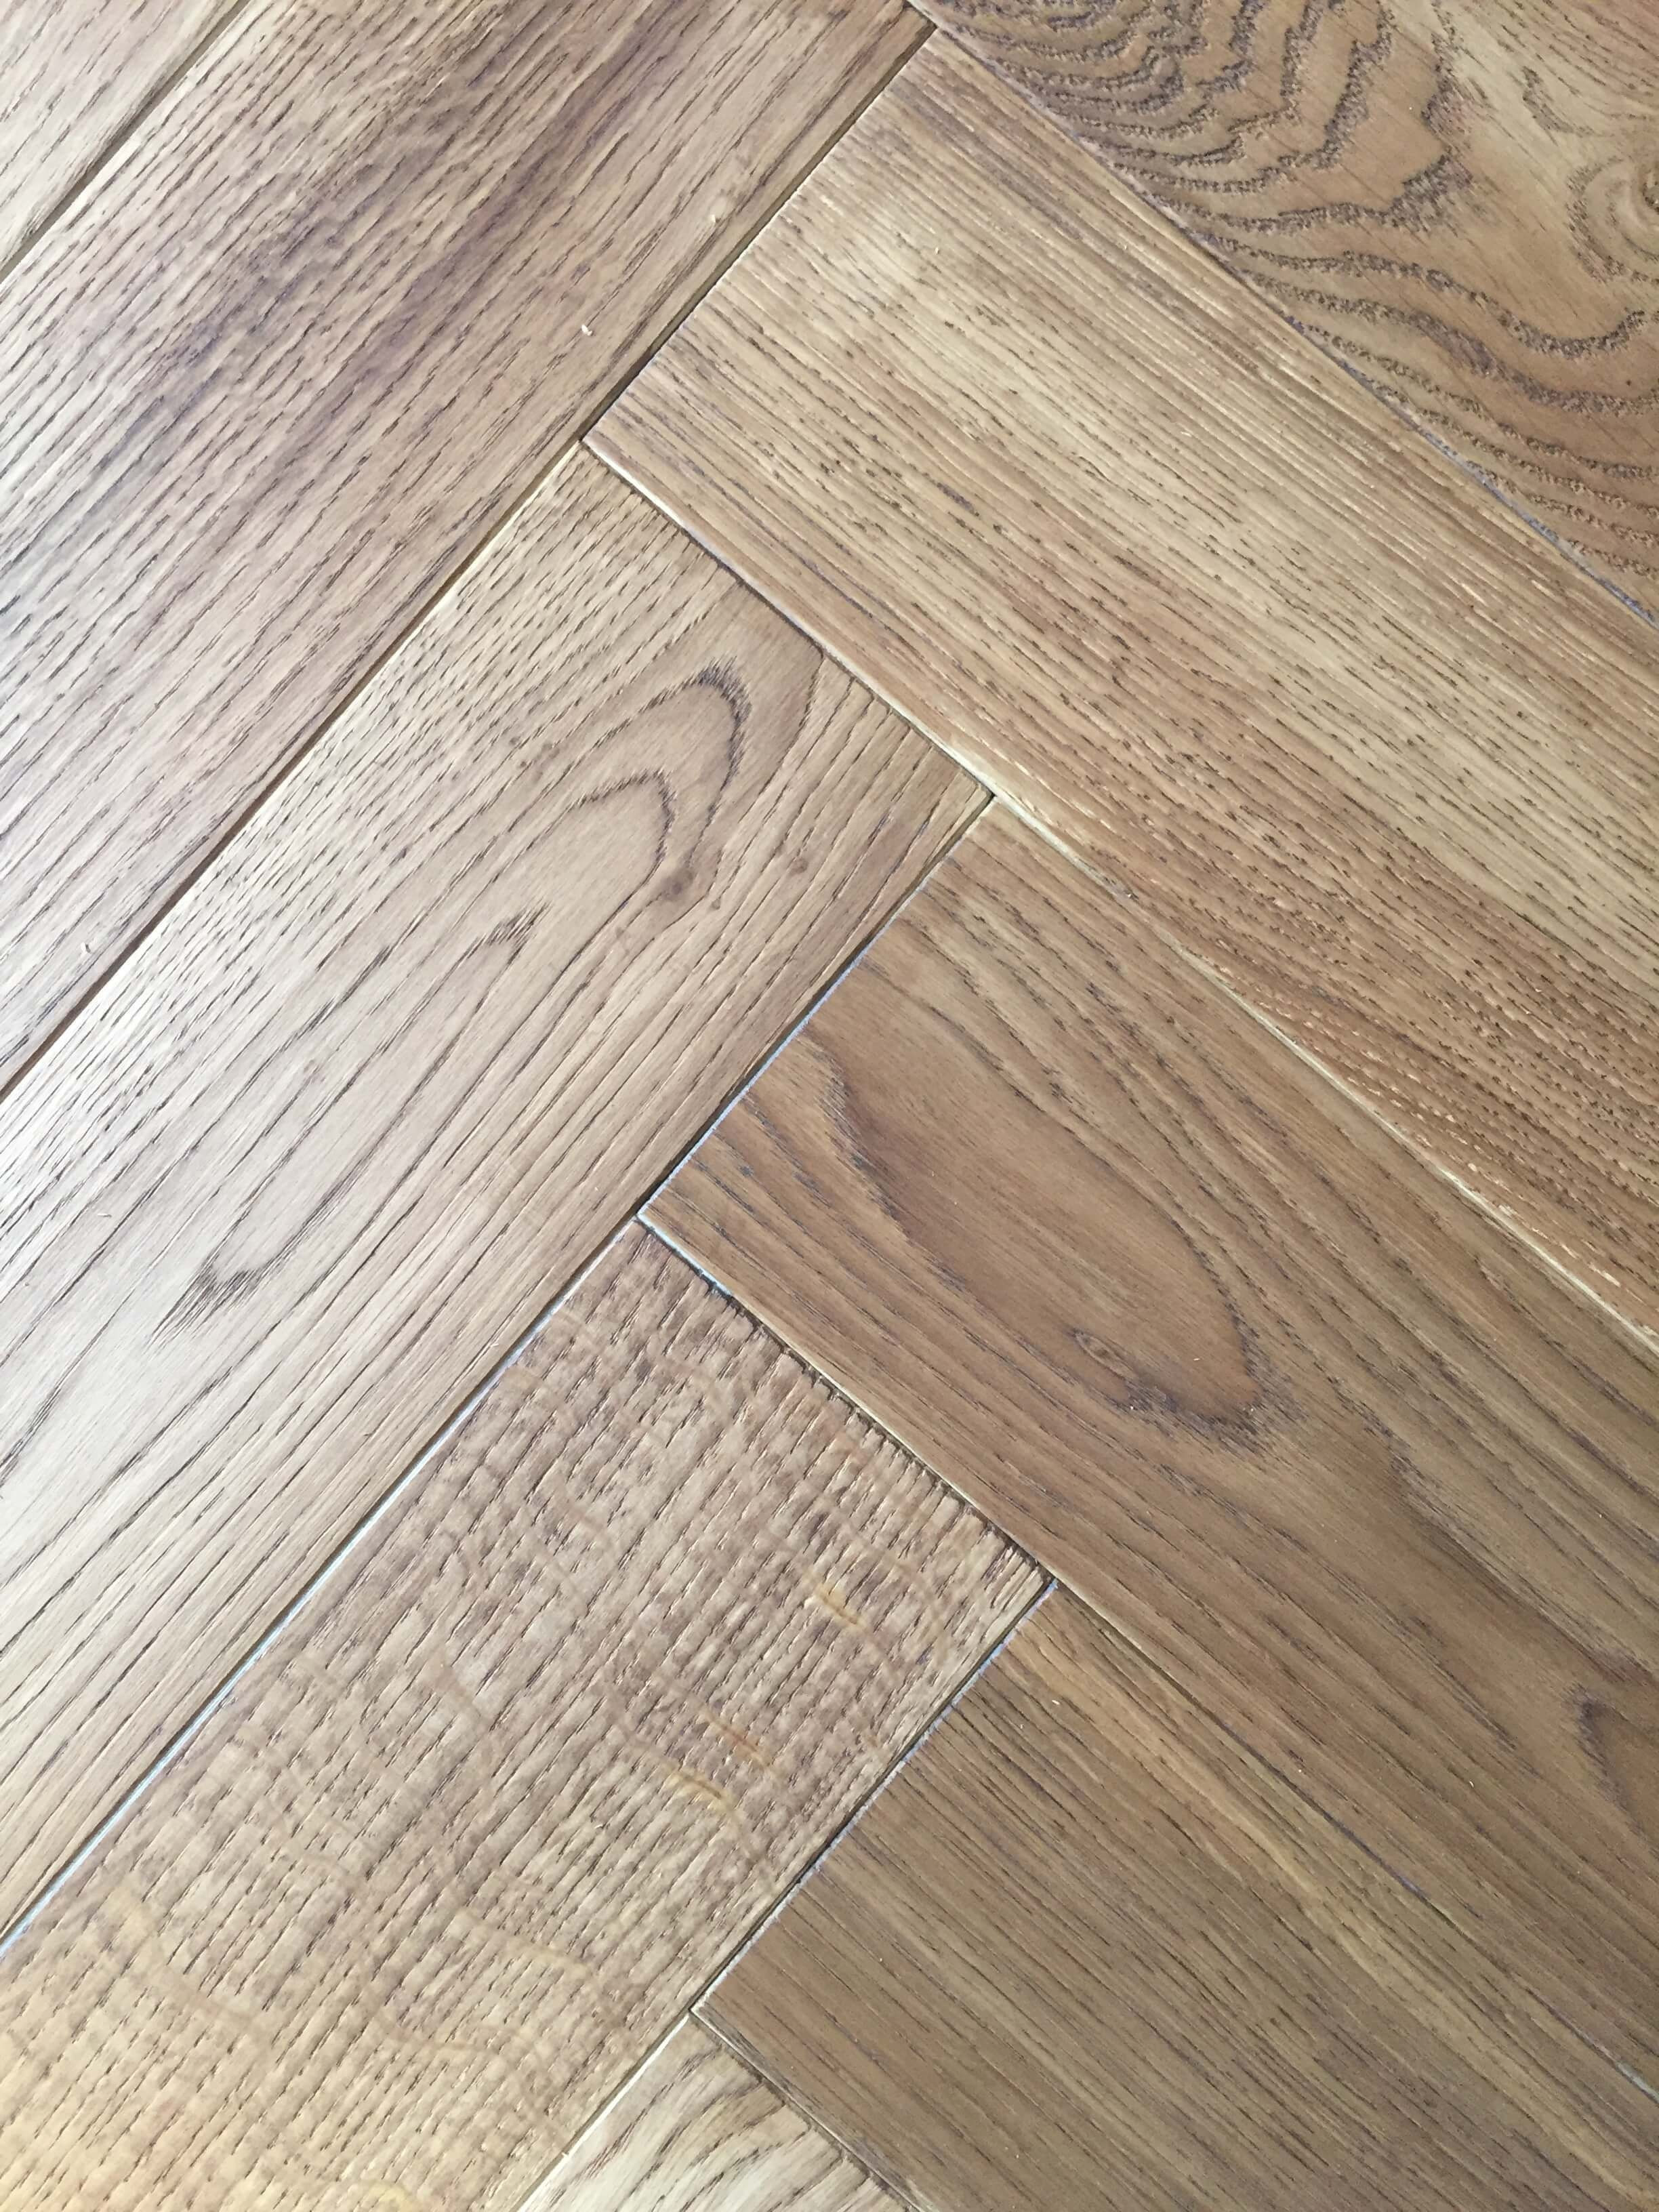 walnut hardwood flooring cost of 38 elegant brown laminate flooring pics flooring design ideas pertaining to brown laminate flooring elegant where to buy laminate flooring collection of 38 elegant brown laminate flooring